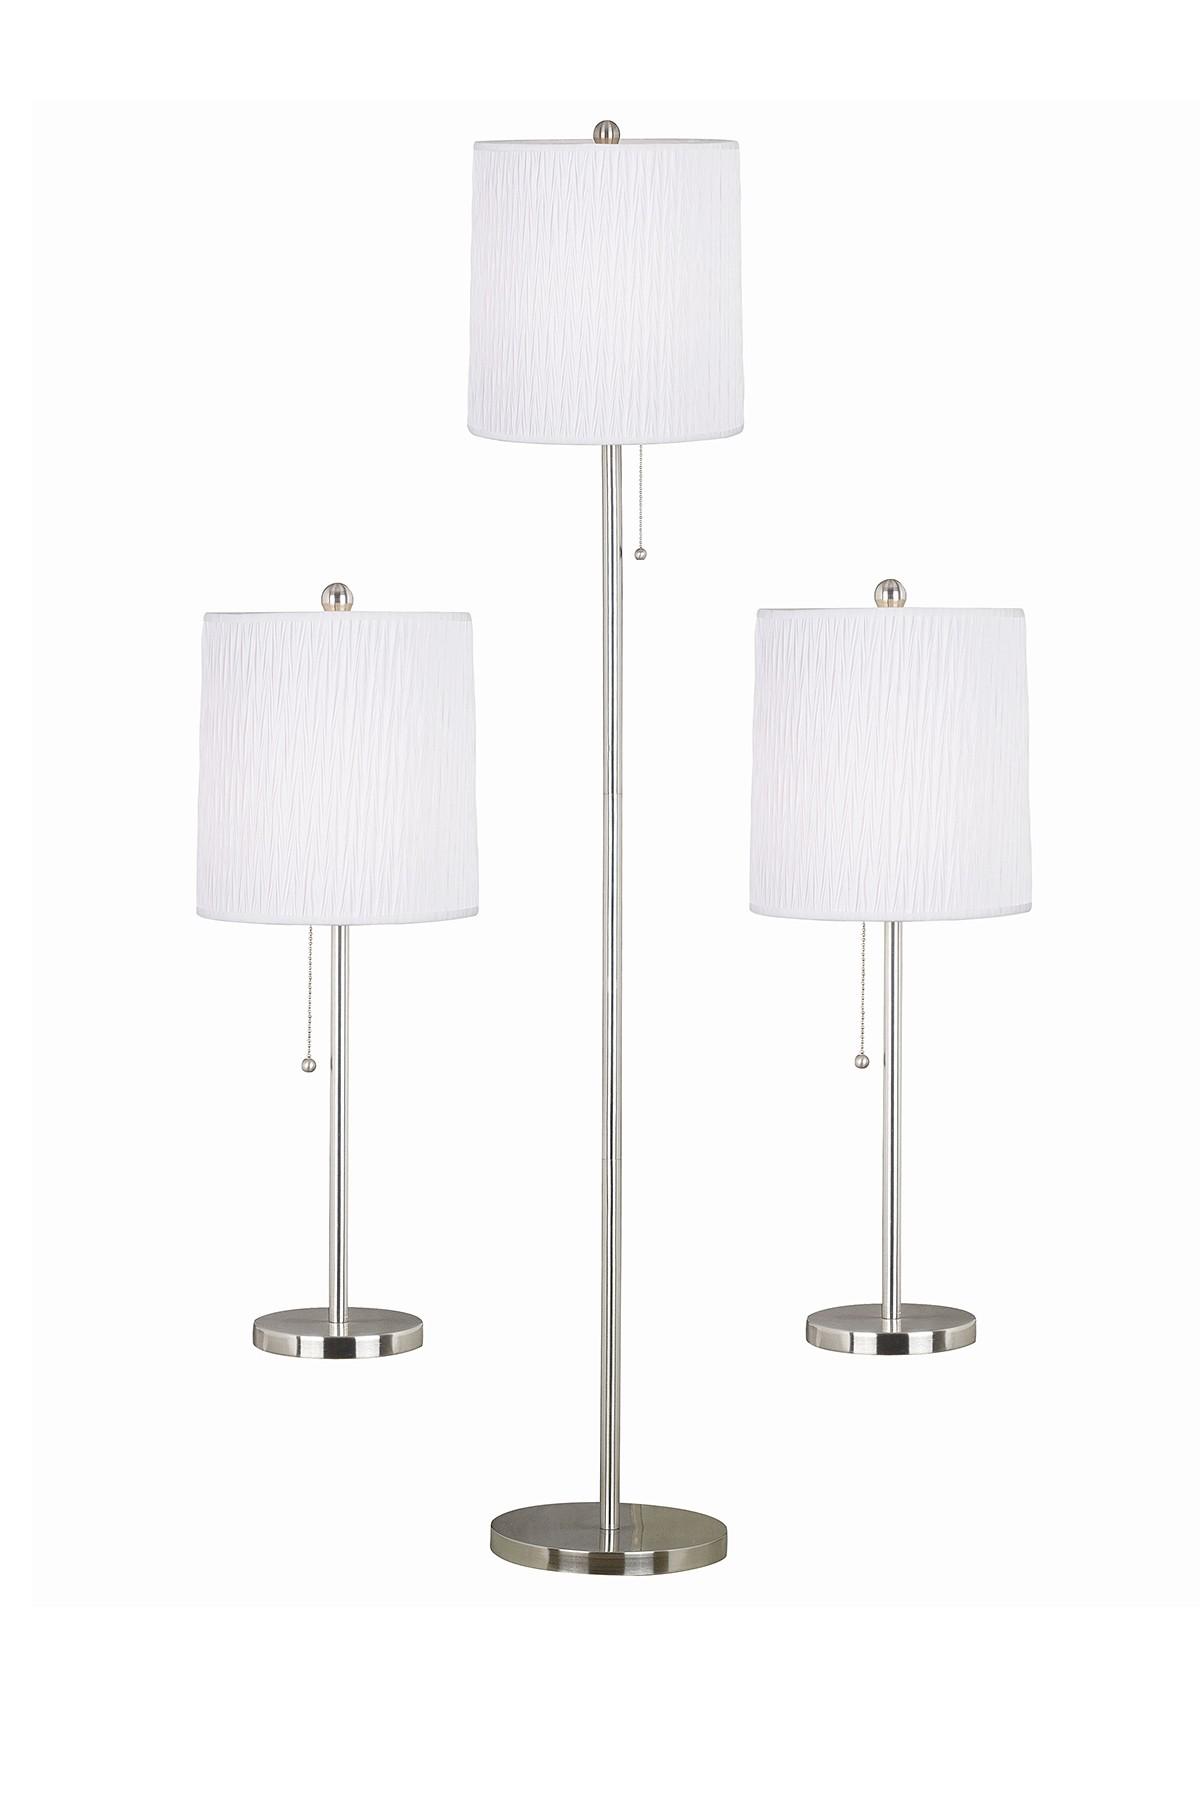 3 lamp set piece table design craft ella brushed steel finish table floor lamp set of